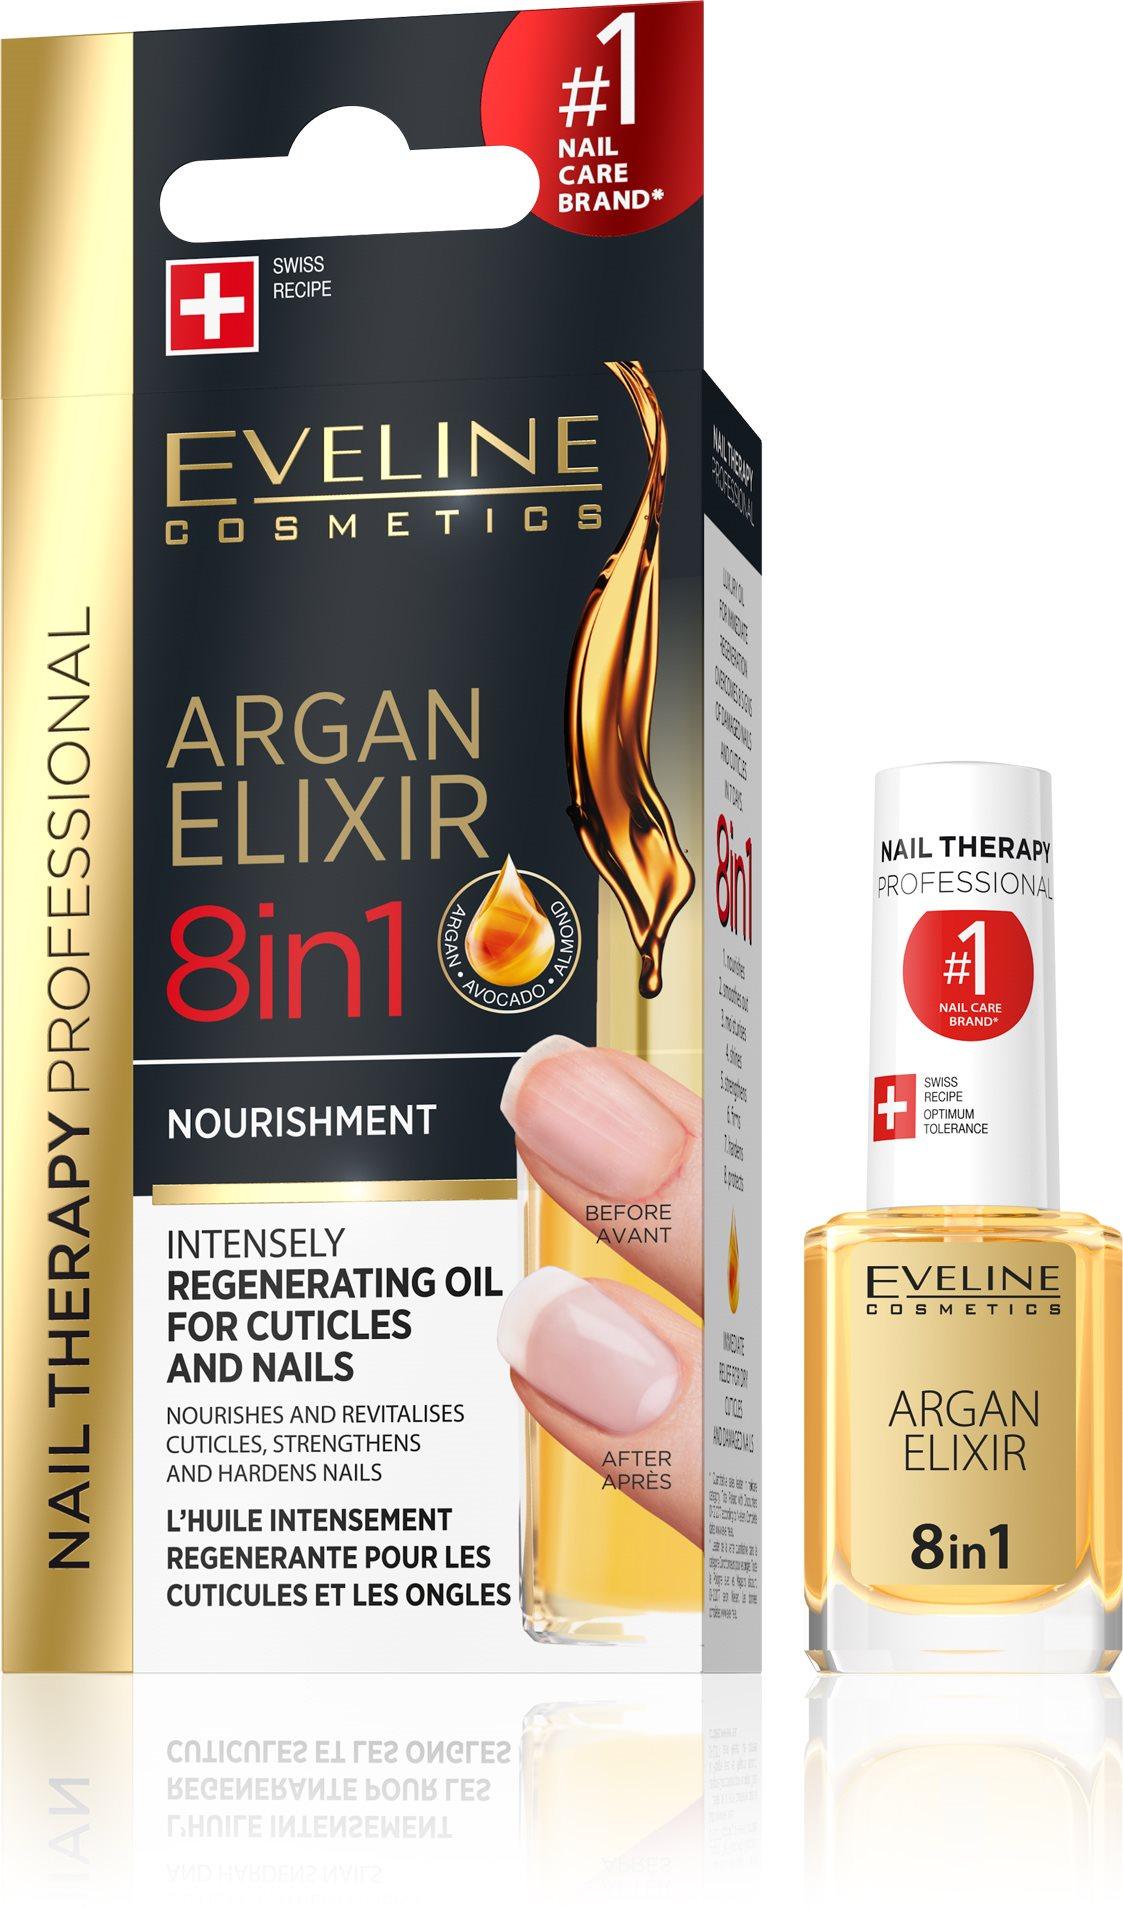 EVELINE Cosmetics Nail Spa körömágy ápló argan olajjal 12 ml